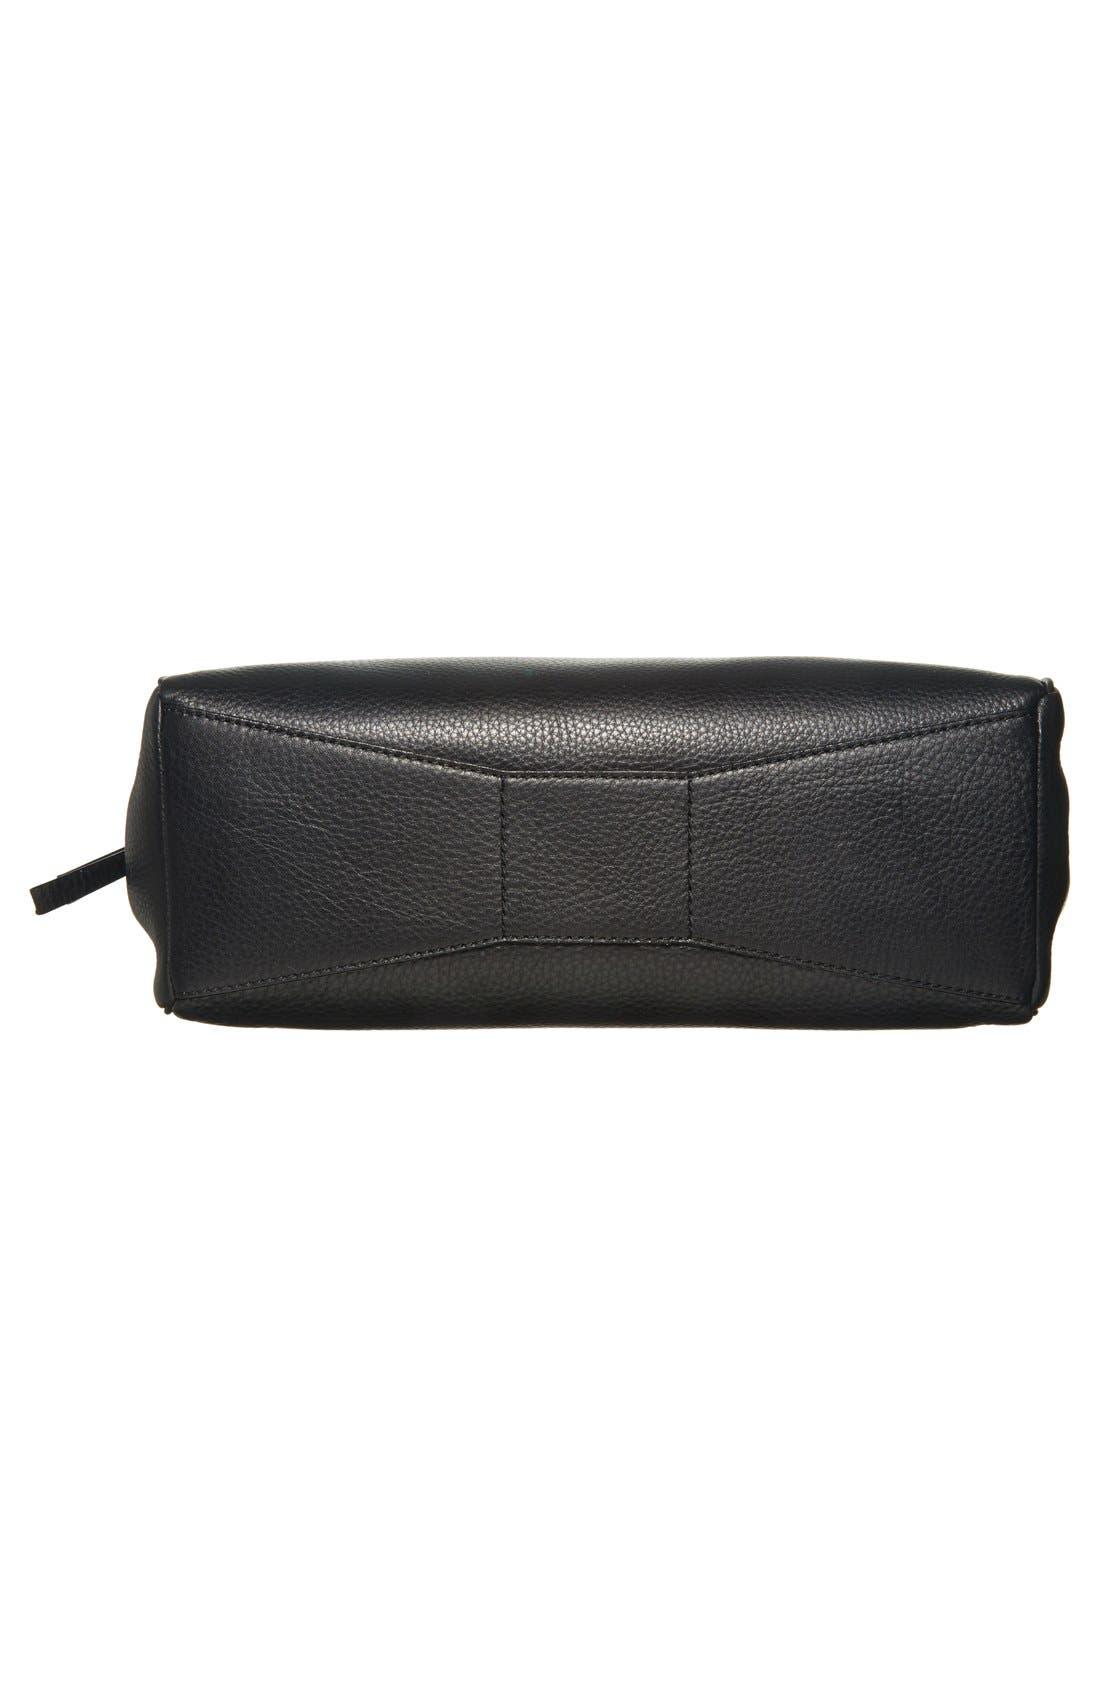 Alternate Image 3  - kate spade new york 'charles street - audrey' leather satchel